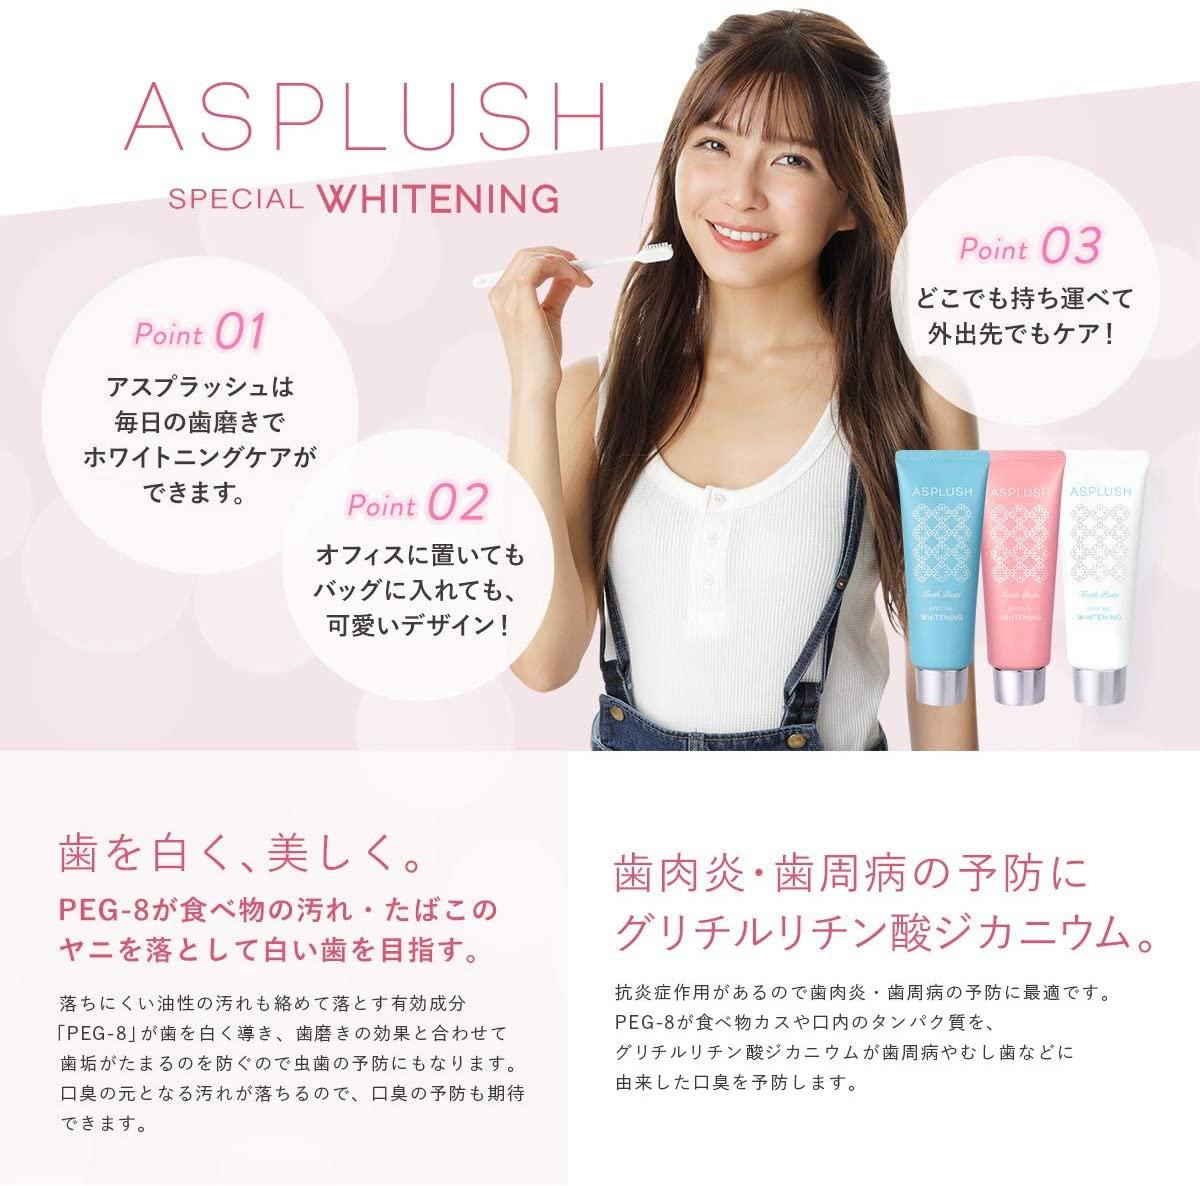 ASPLUSH(アスプラッシュ)ホワイトニング 歯磨き粉の商品画像8